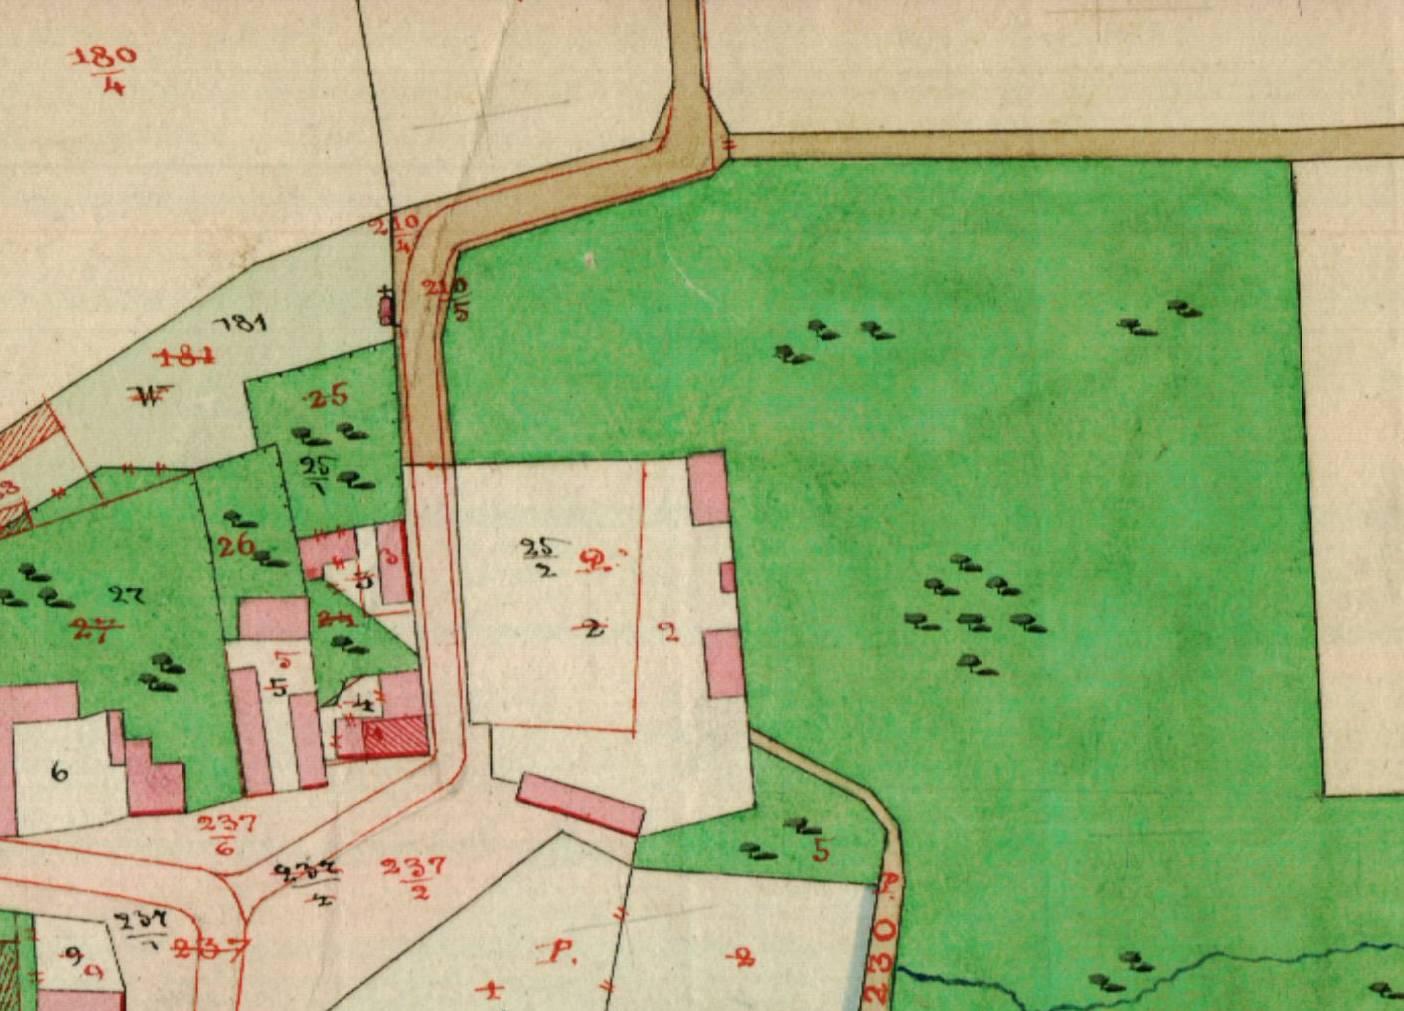 kaple_20_historicka_mapa